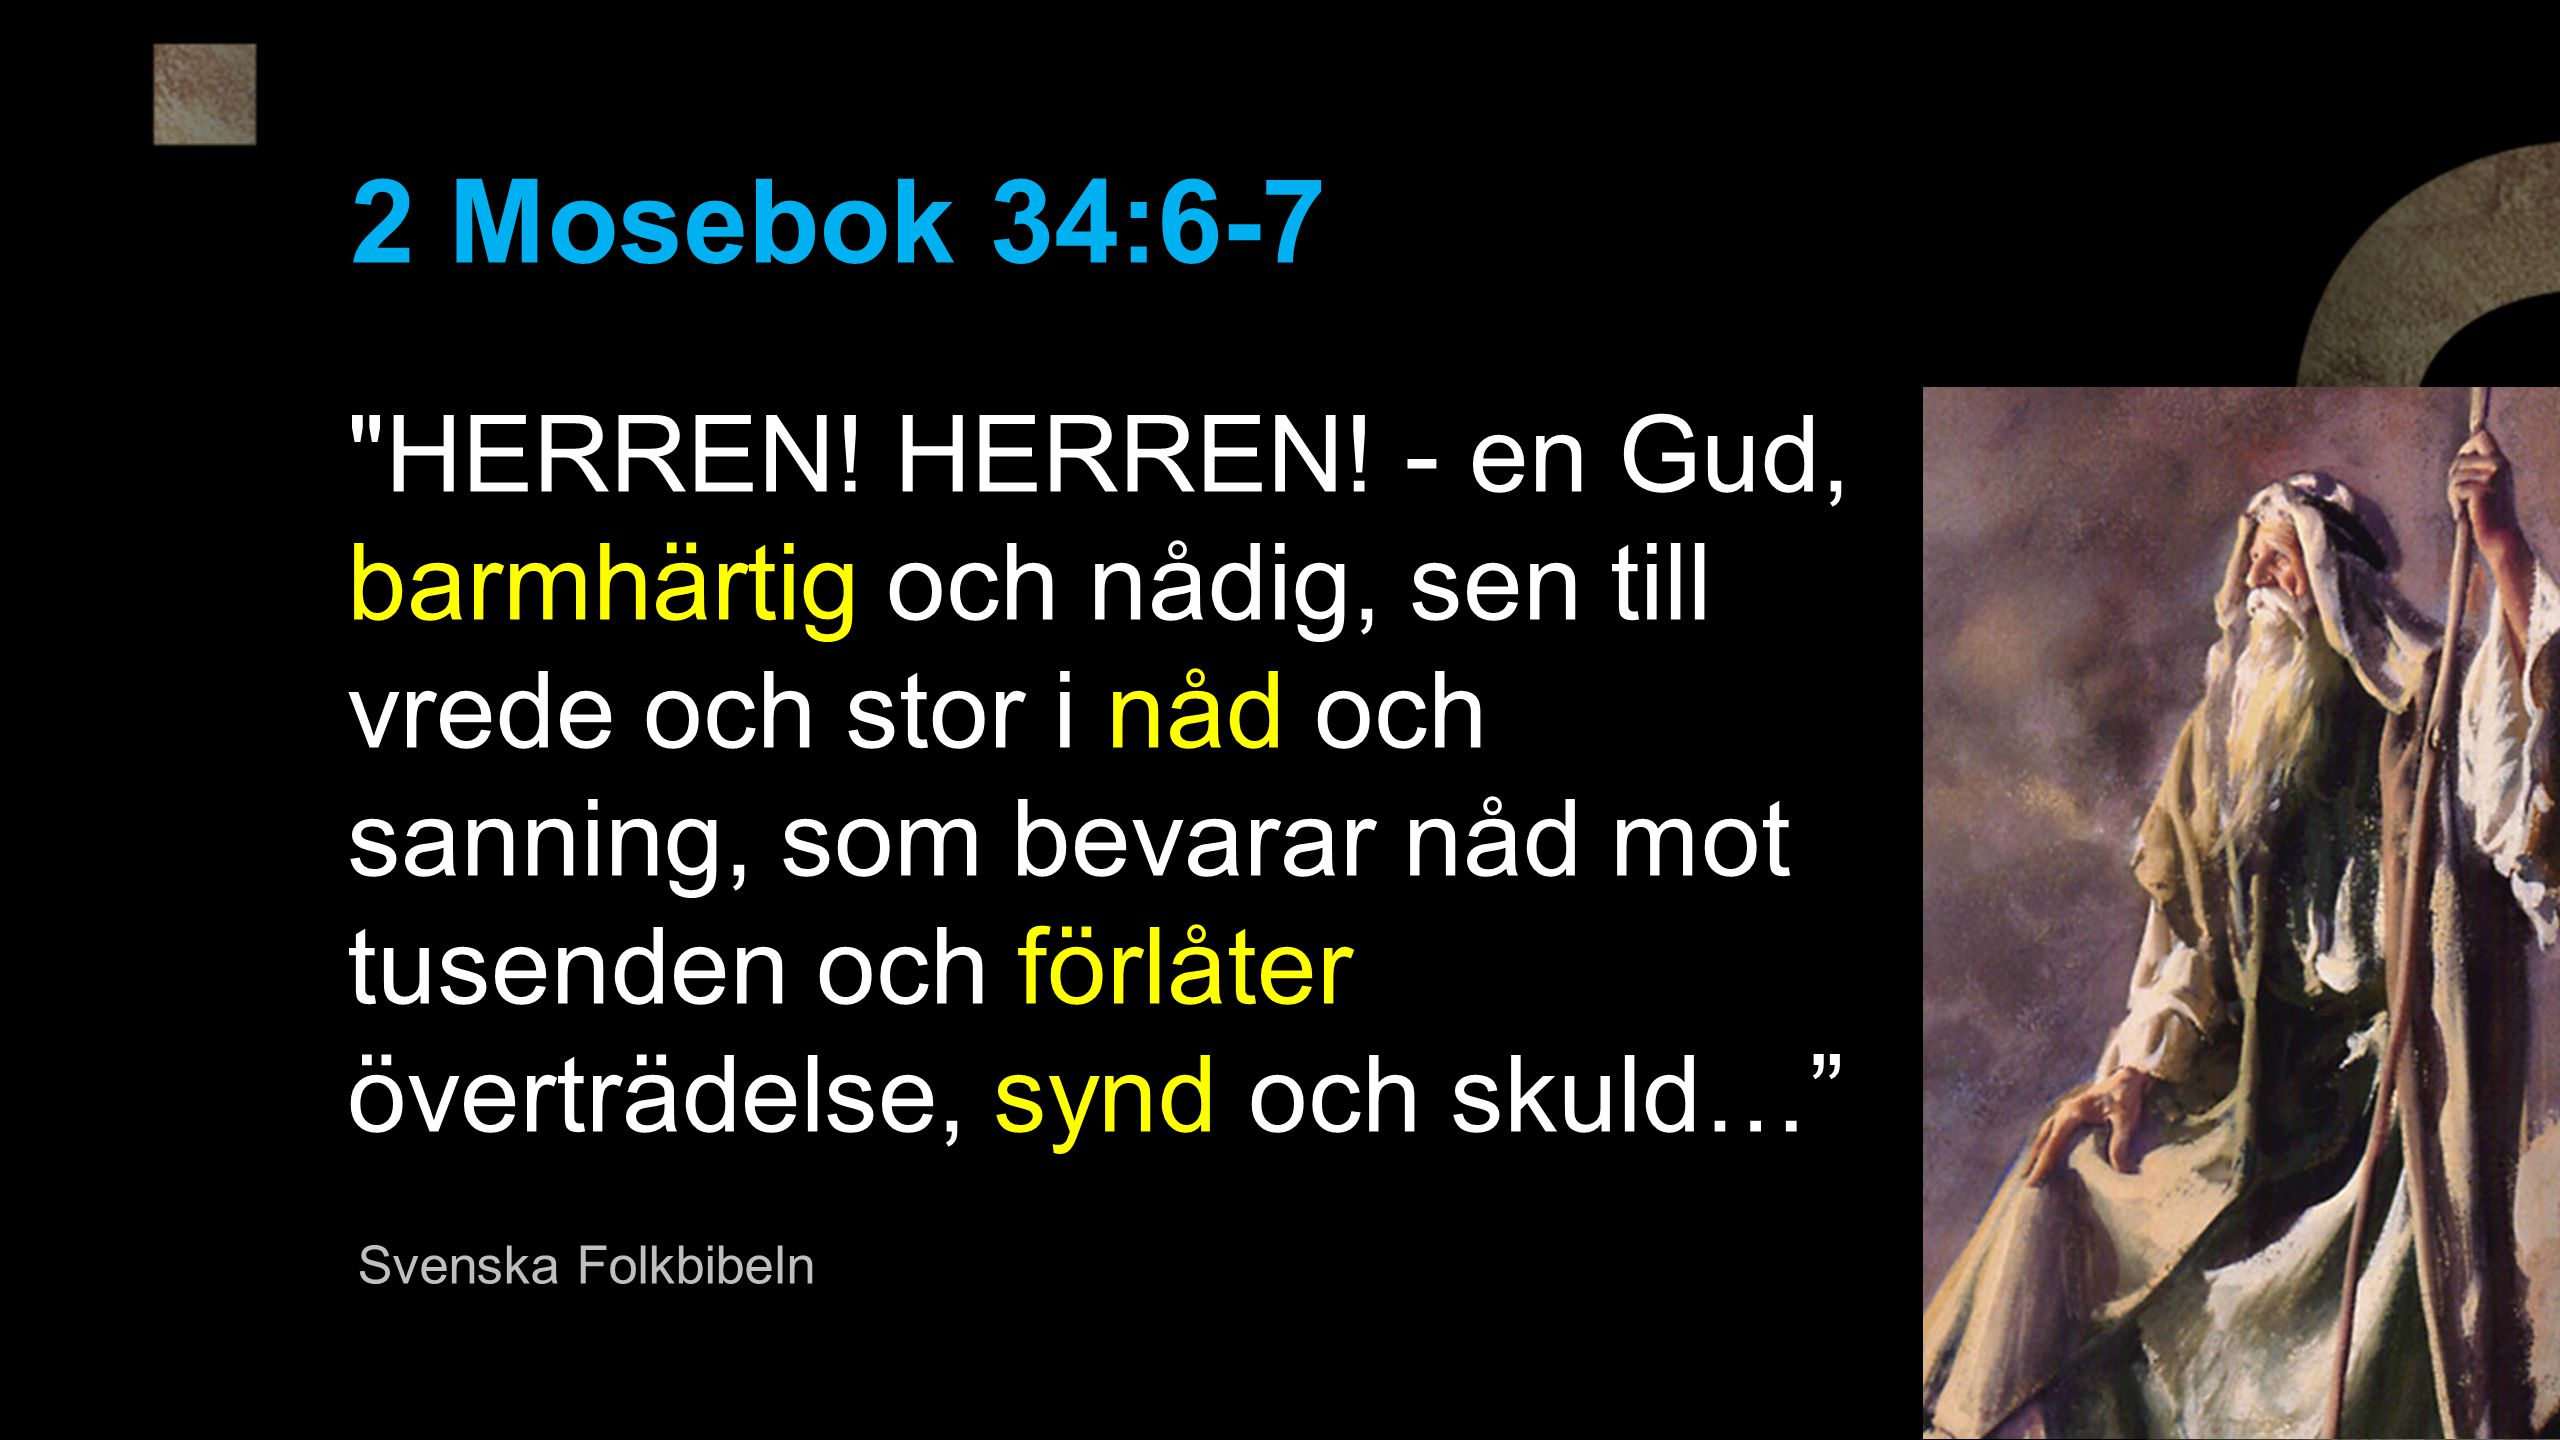 2 Mosebok 34:6-7